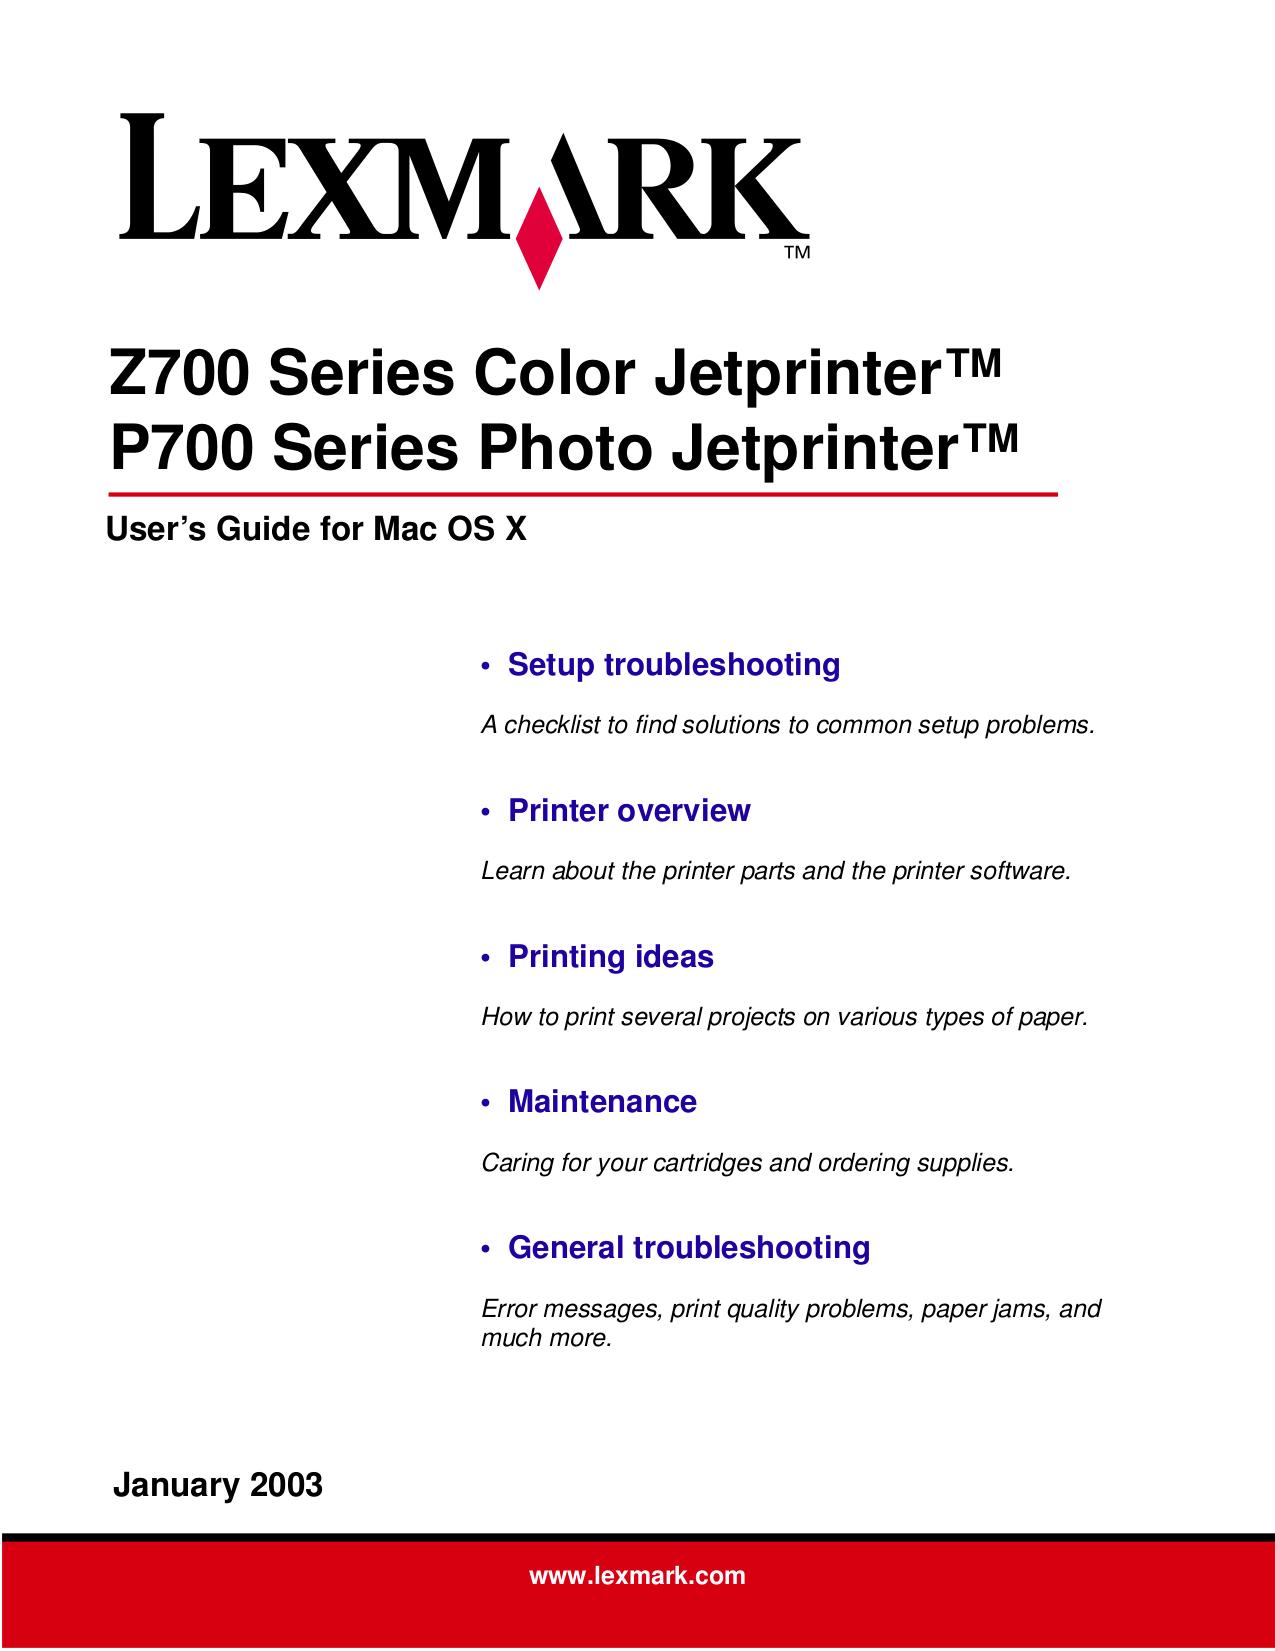 pdf for Lexmark Printer P700 manual